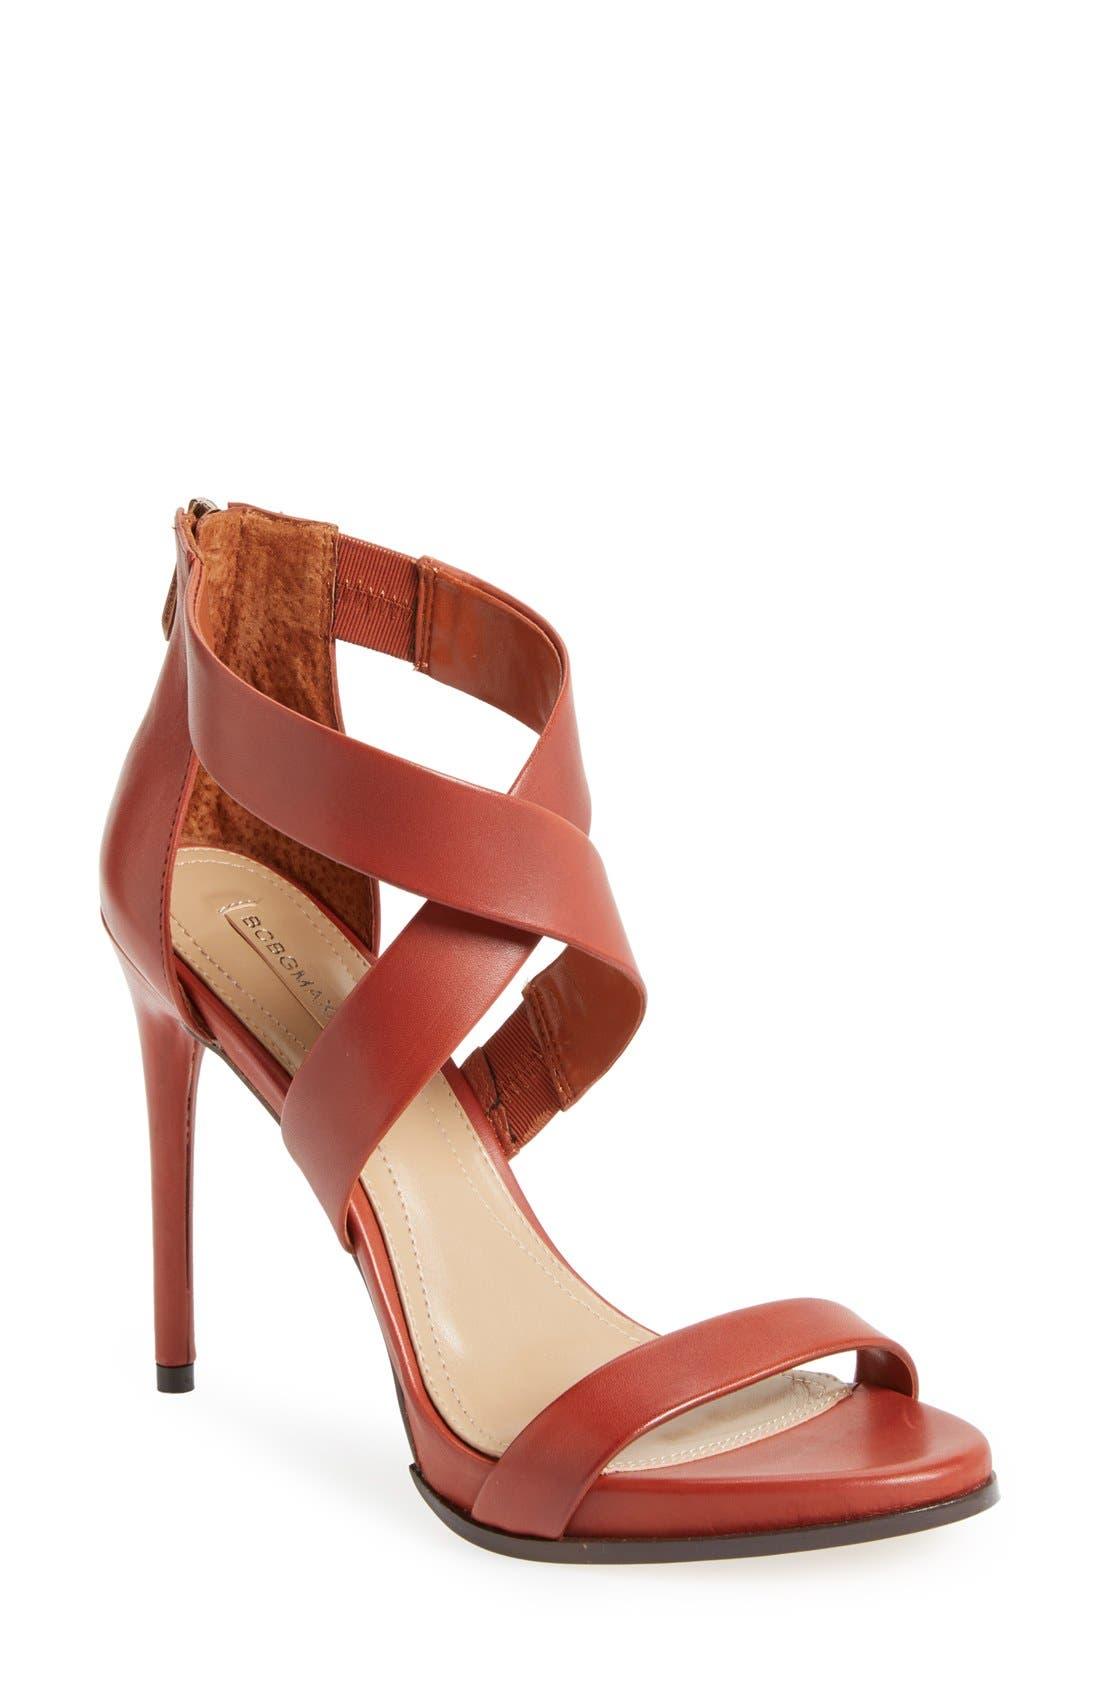 Main Image - BCBGMAXAZRIA 'Elyse' Sandal (Women)